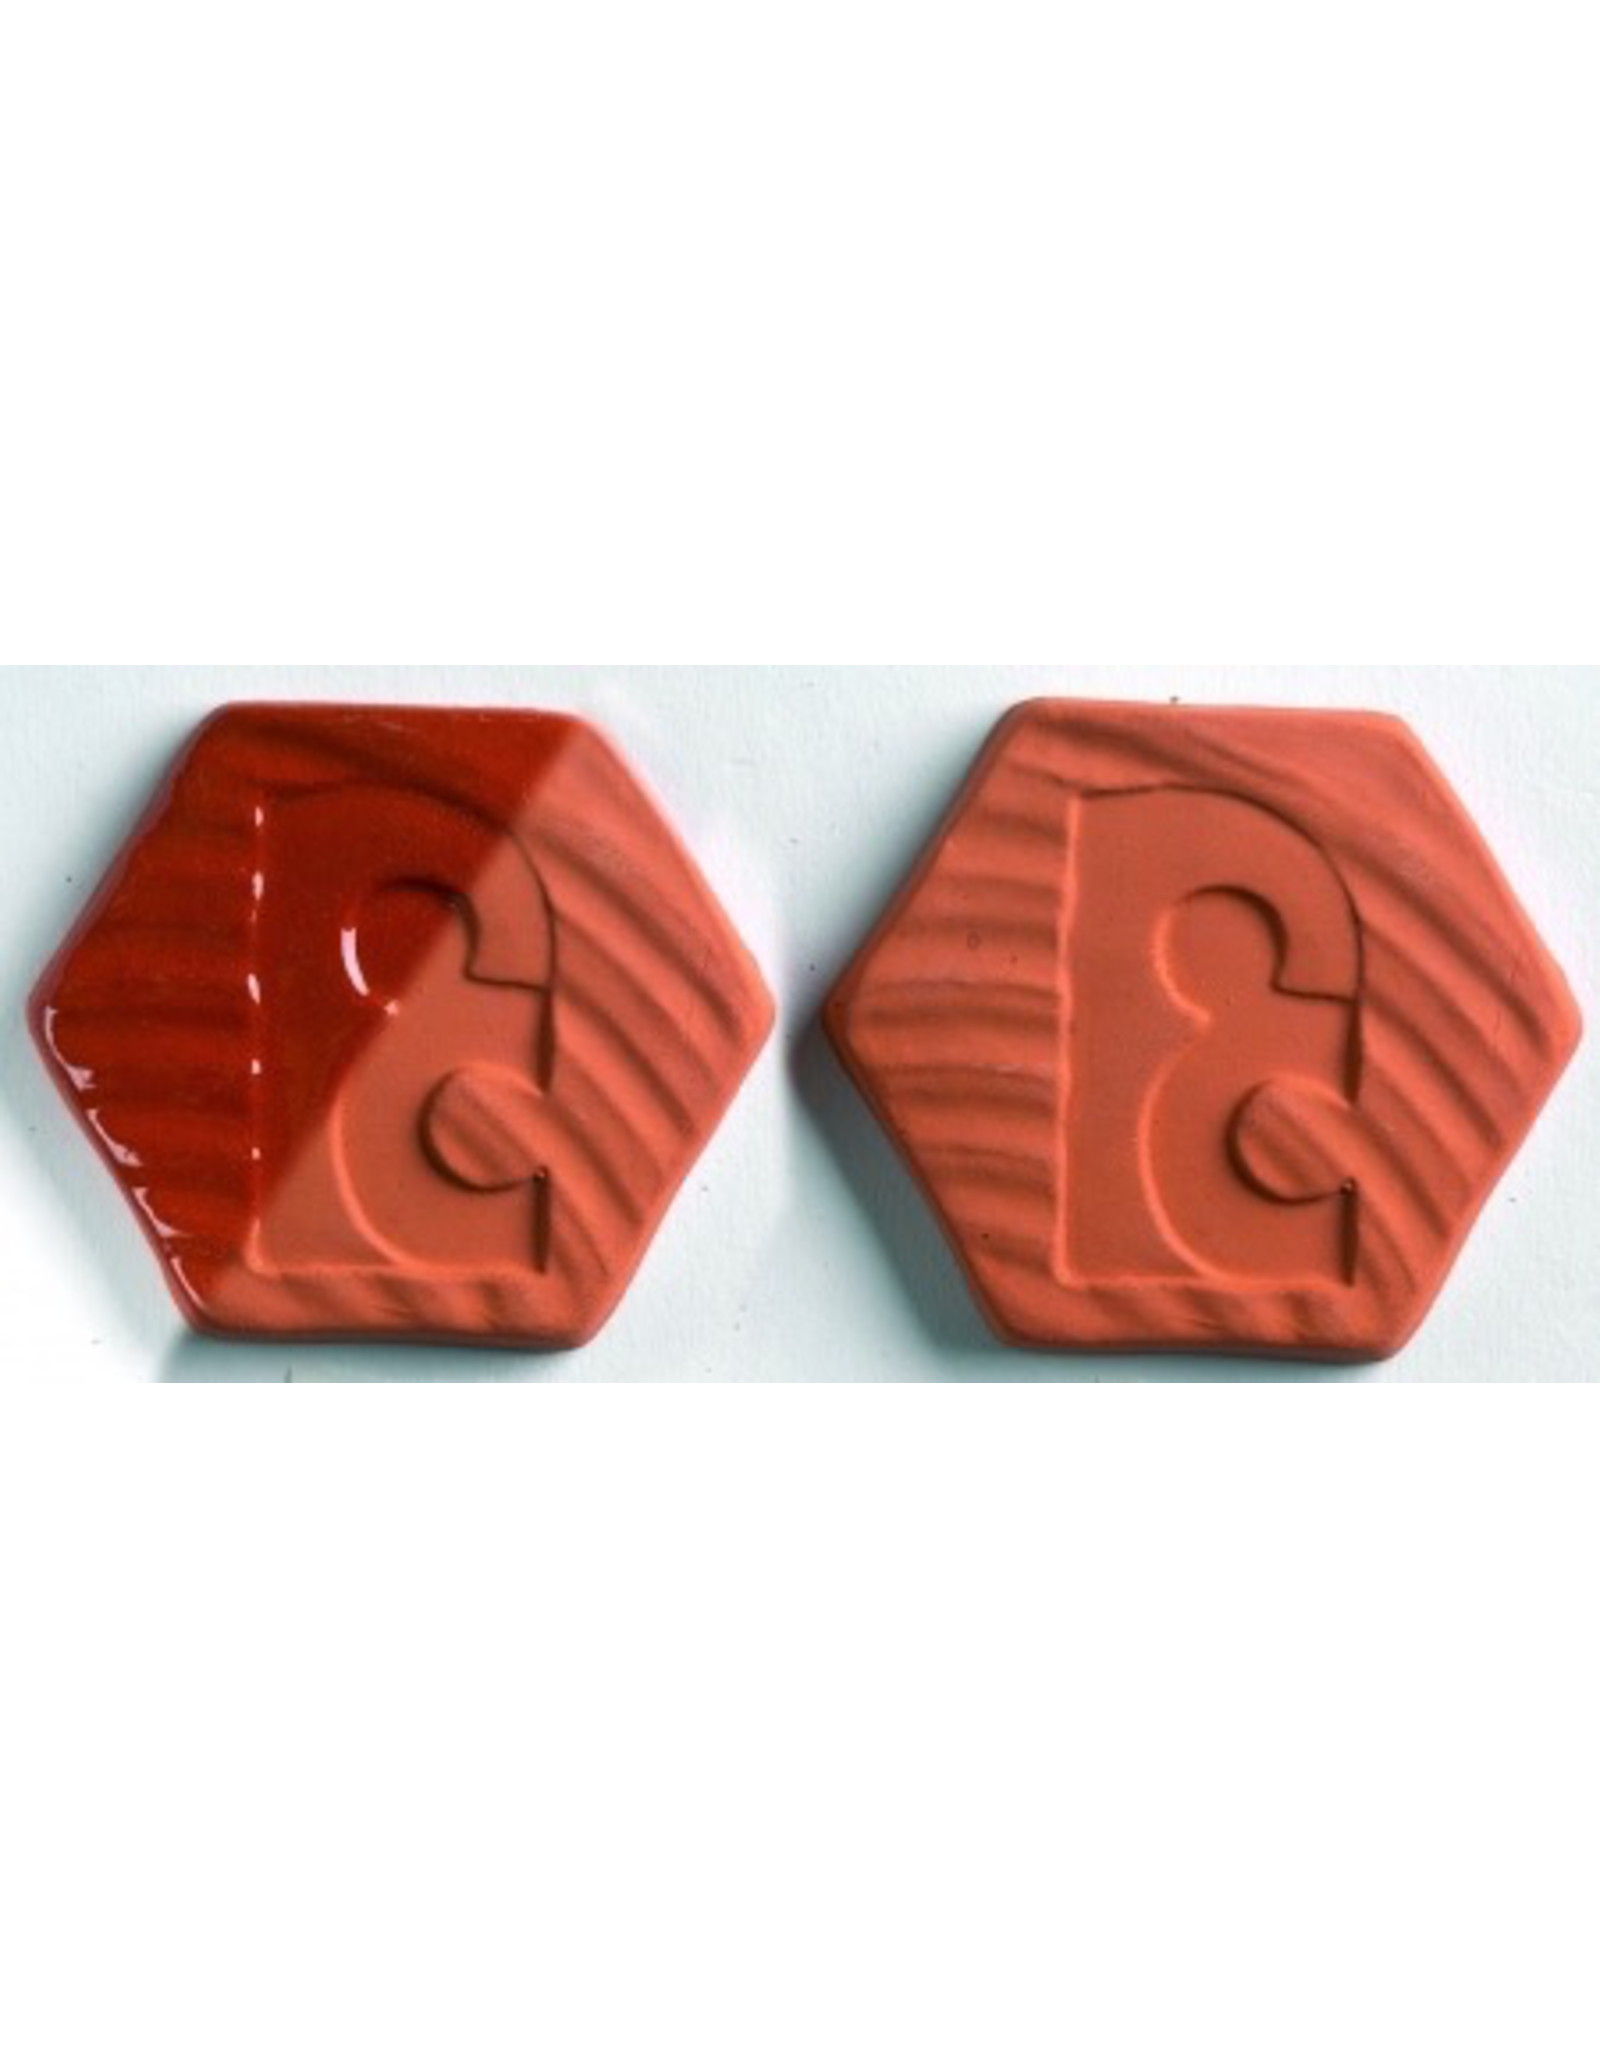 Potterycrafts Potterycrafts Red Terracotta Clay Lf 1020°C - 1160°C